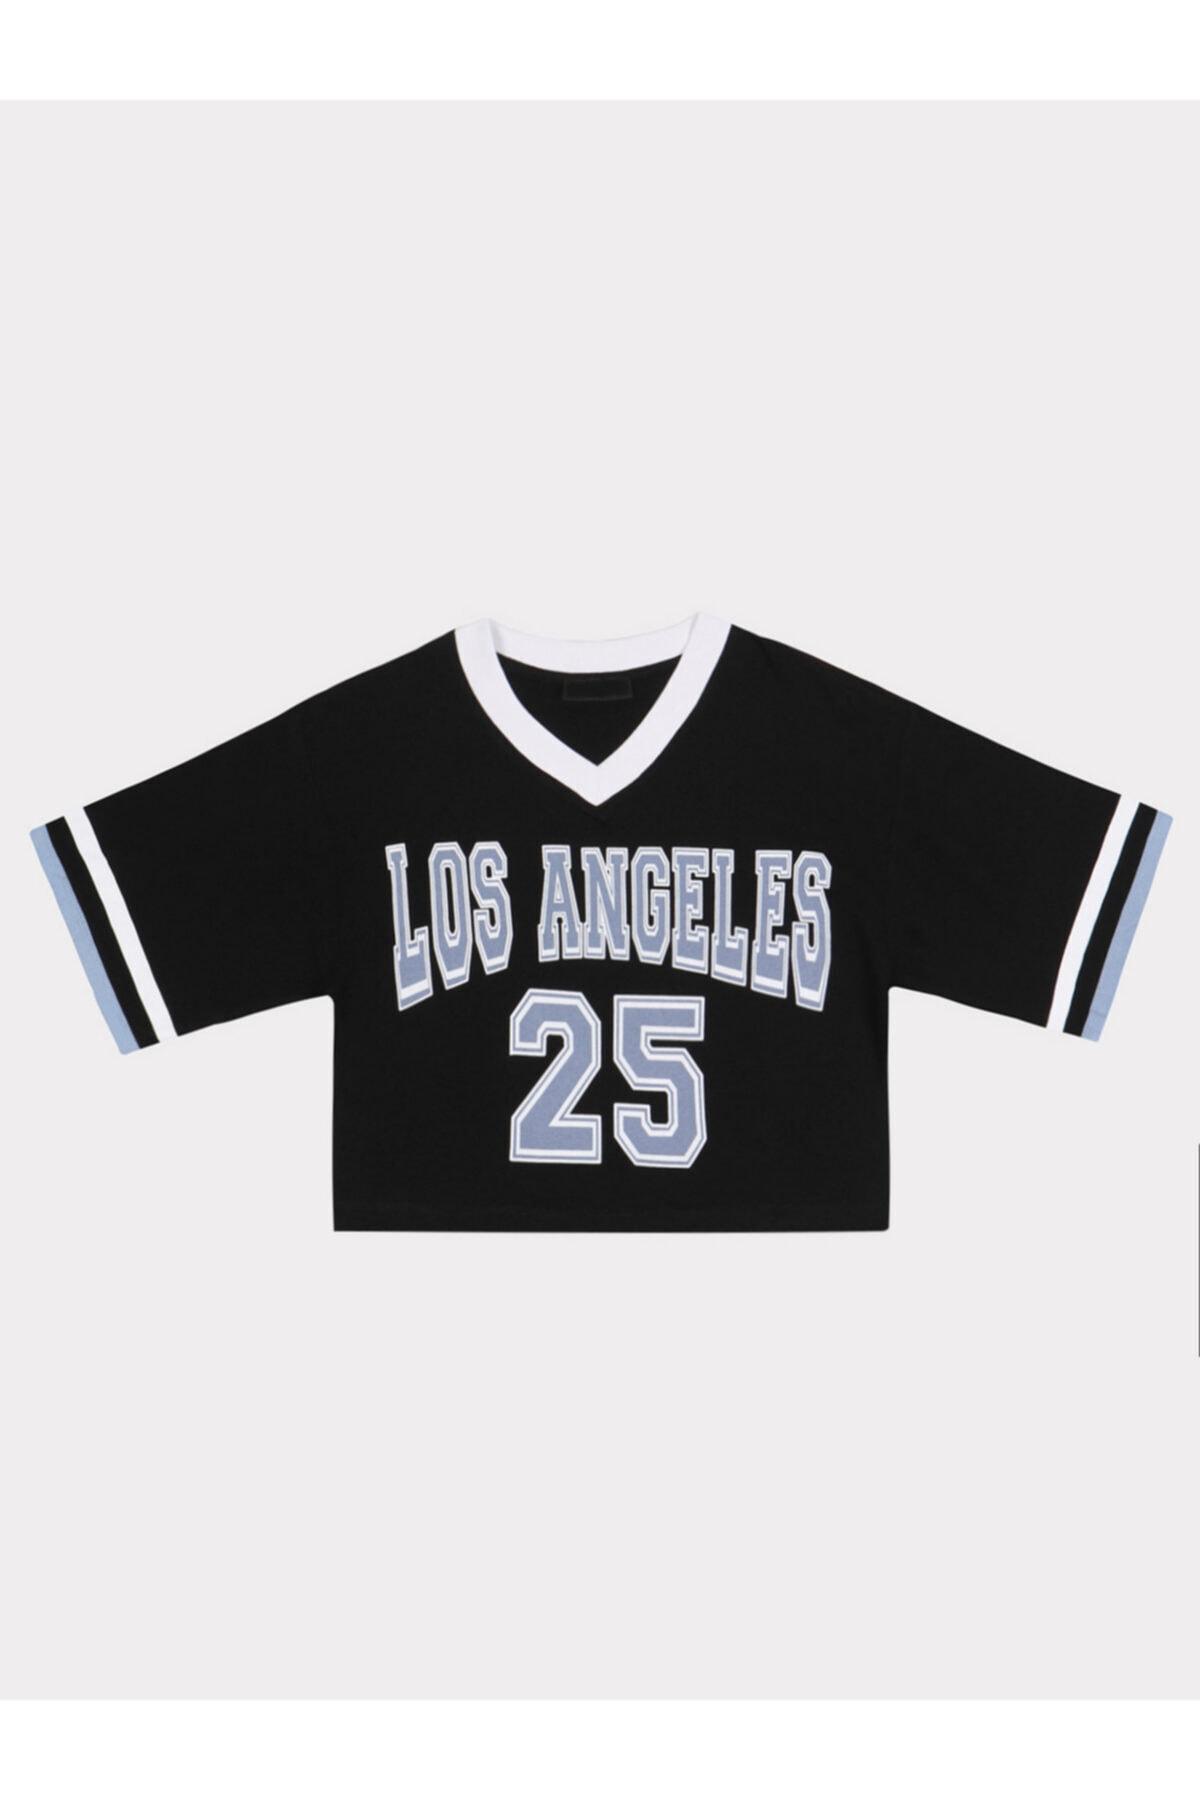 Kadın Siyah Los Angeles Baskılı T-shırt 4389-002